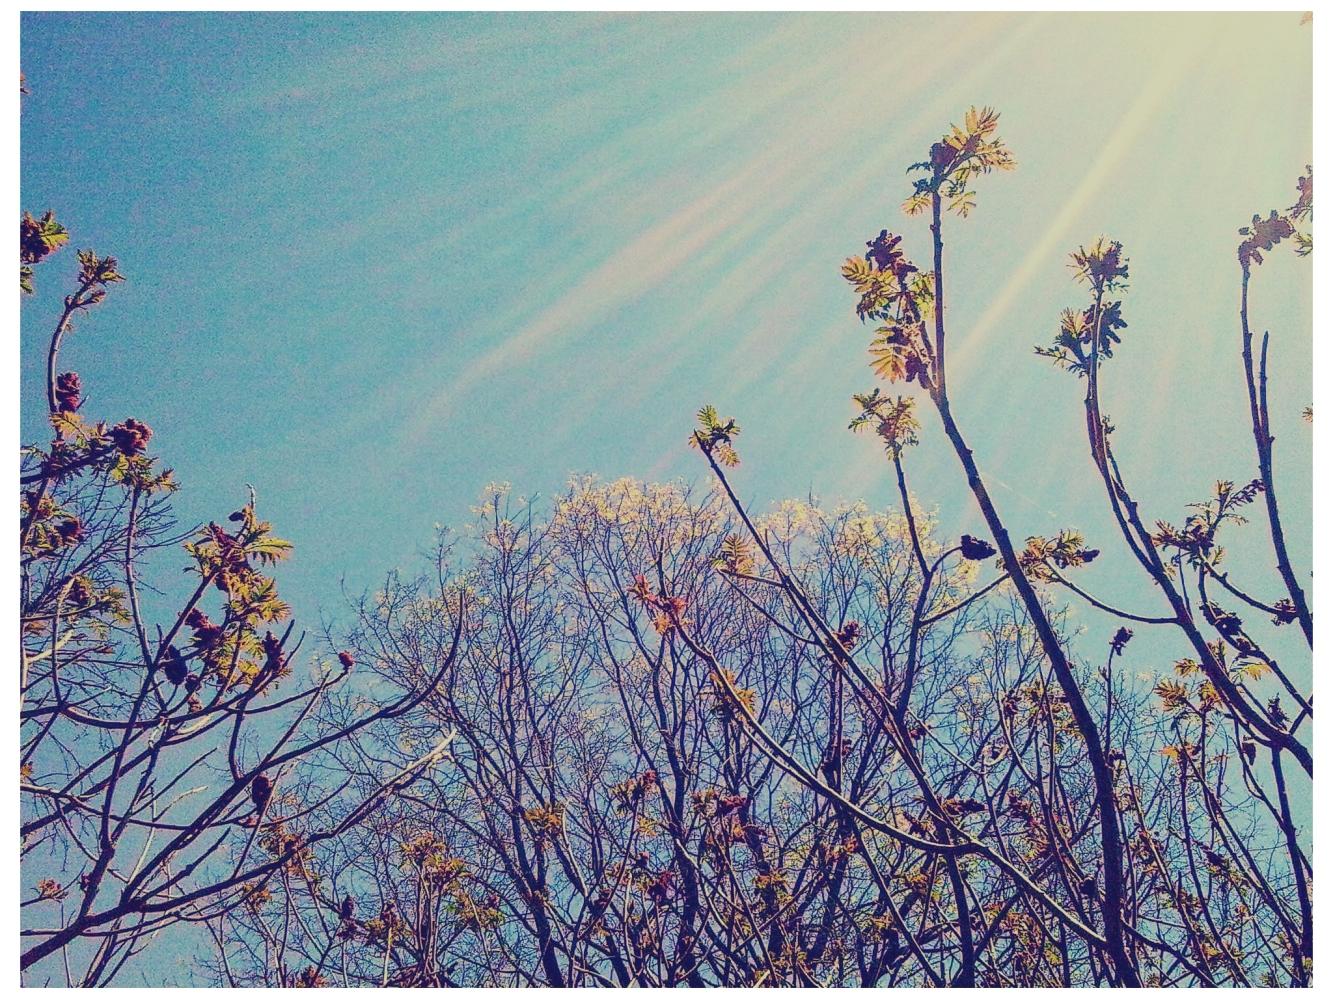 Sky Of Joy